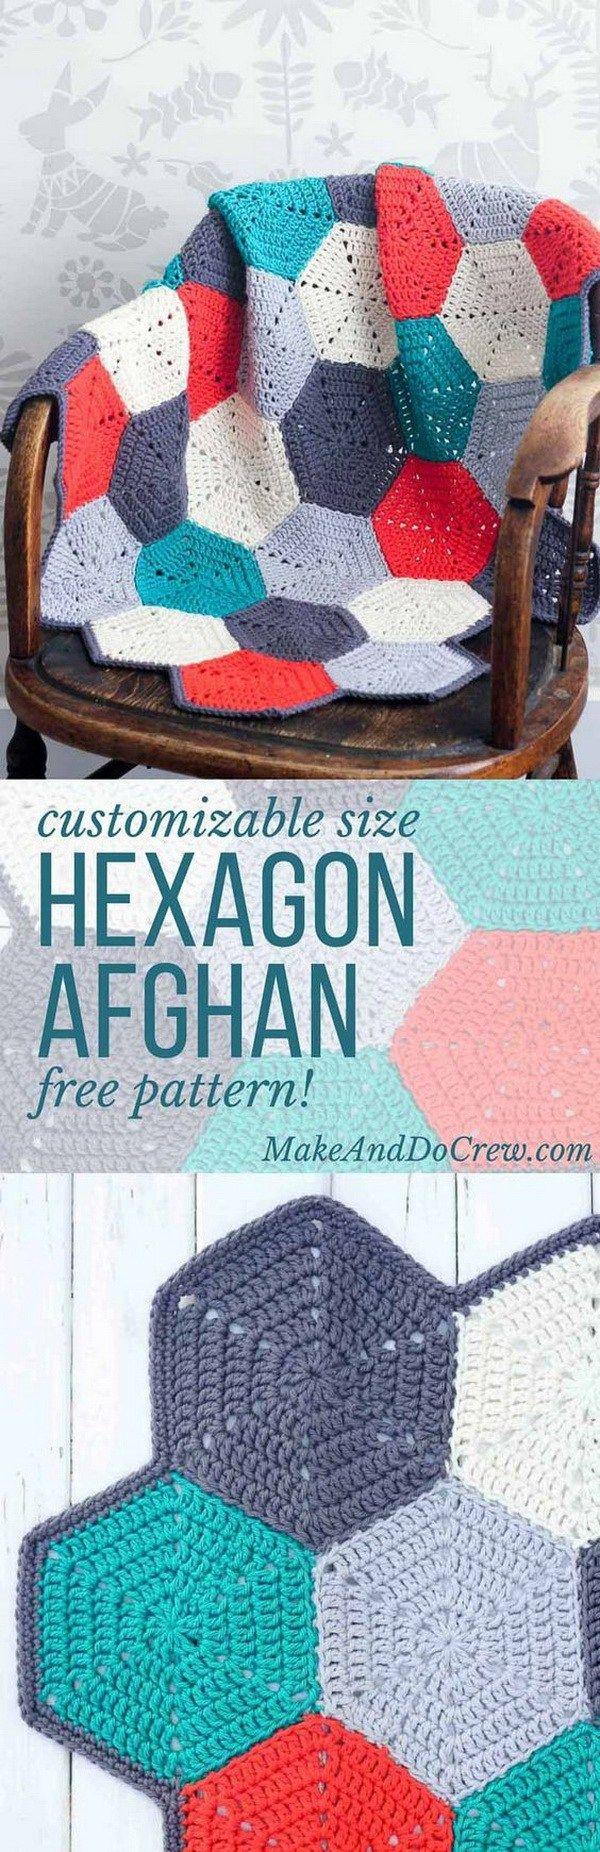 35+ Free Crochet Blanket Patterns & Tutorials | Pinterest | Cuadrados